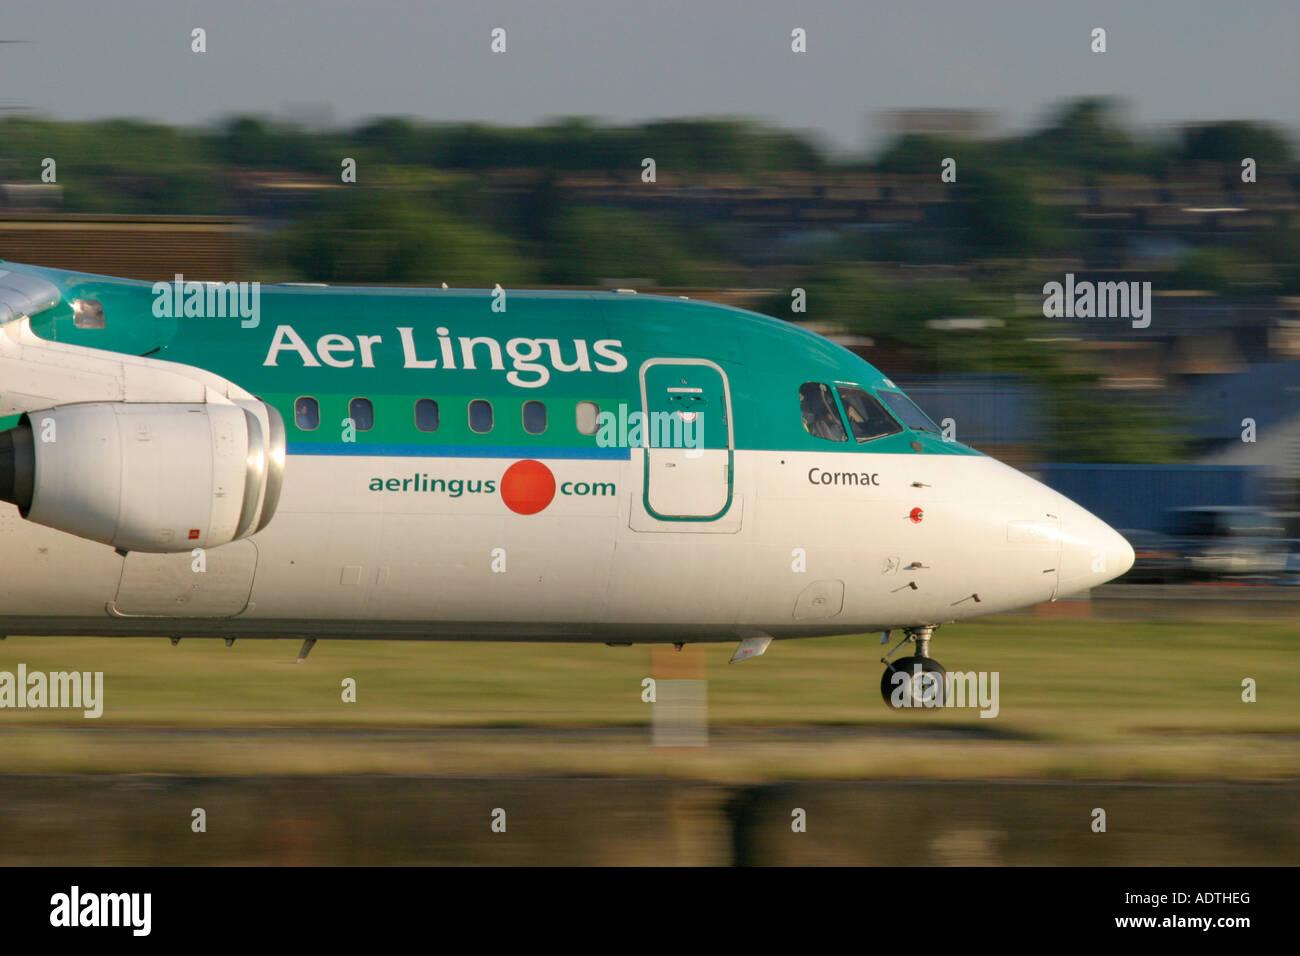 Aer Lingus British Aerospace BAe-146-300 - Stock Image